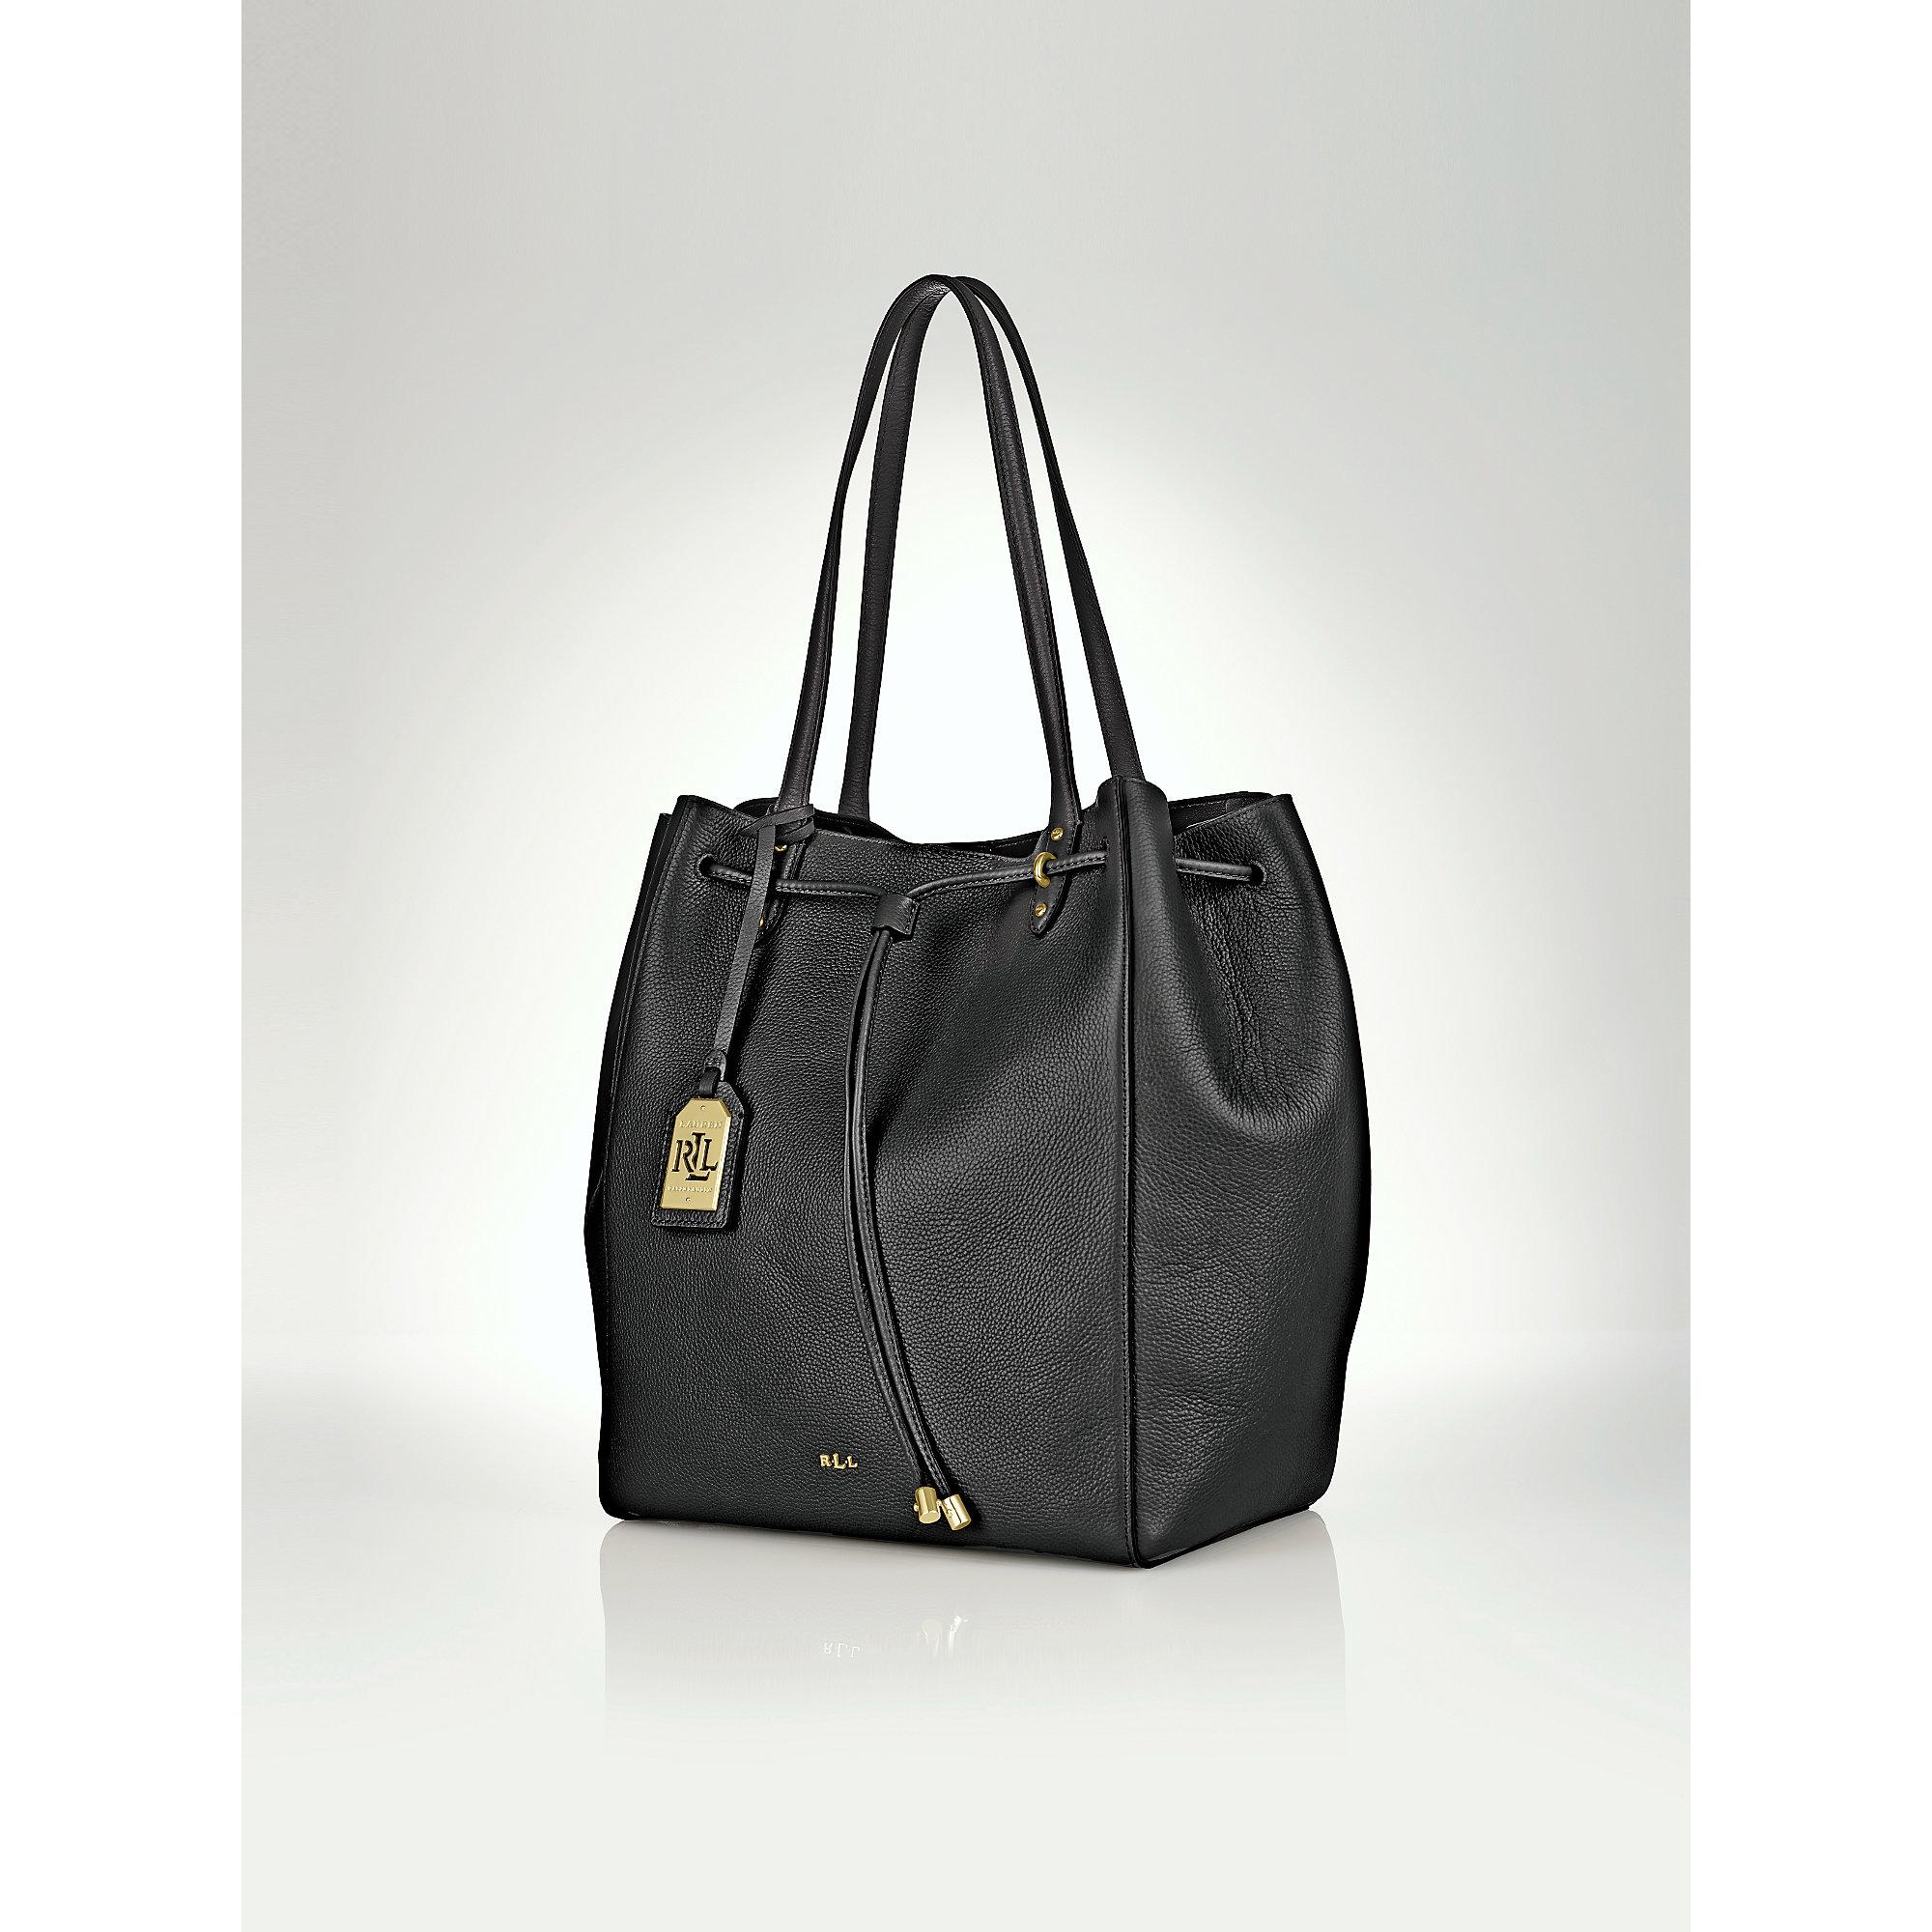 f5a17de892a70 Lyst - Ralph Lauren Oxford Leather Tote in Black